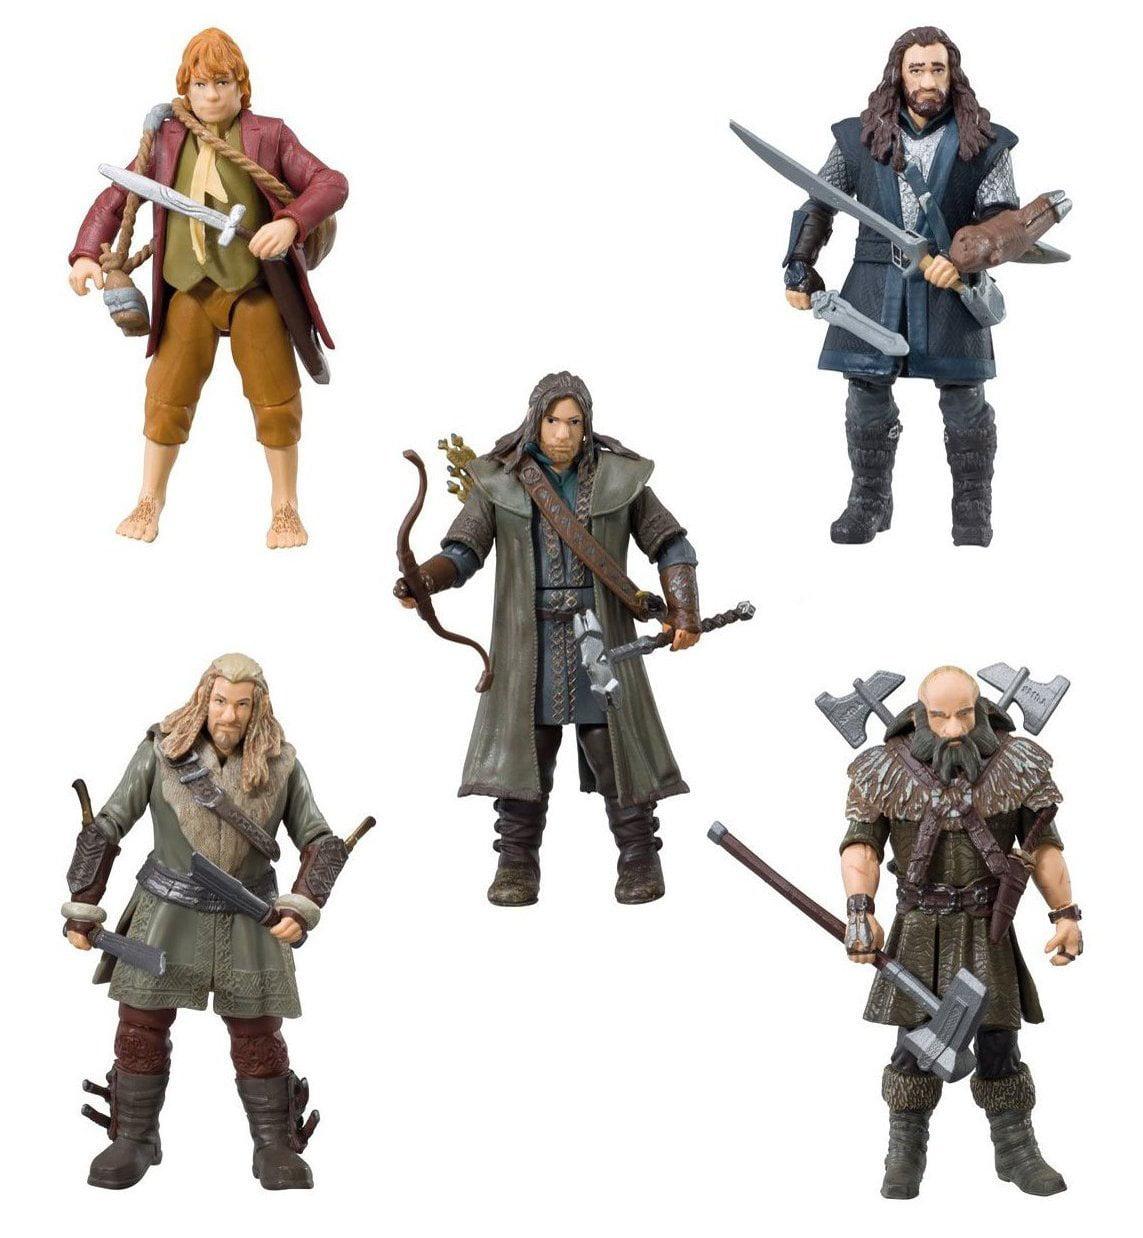 "The Bridge Direct Hobbit Hero Pack - Bilbo, Thorin, Dwalin, Kili and Fili 3.75"" Figure Box Set Multi-Colored"